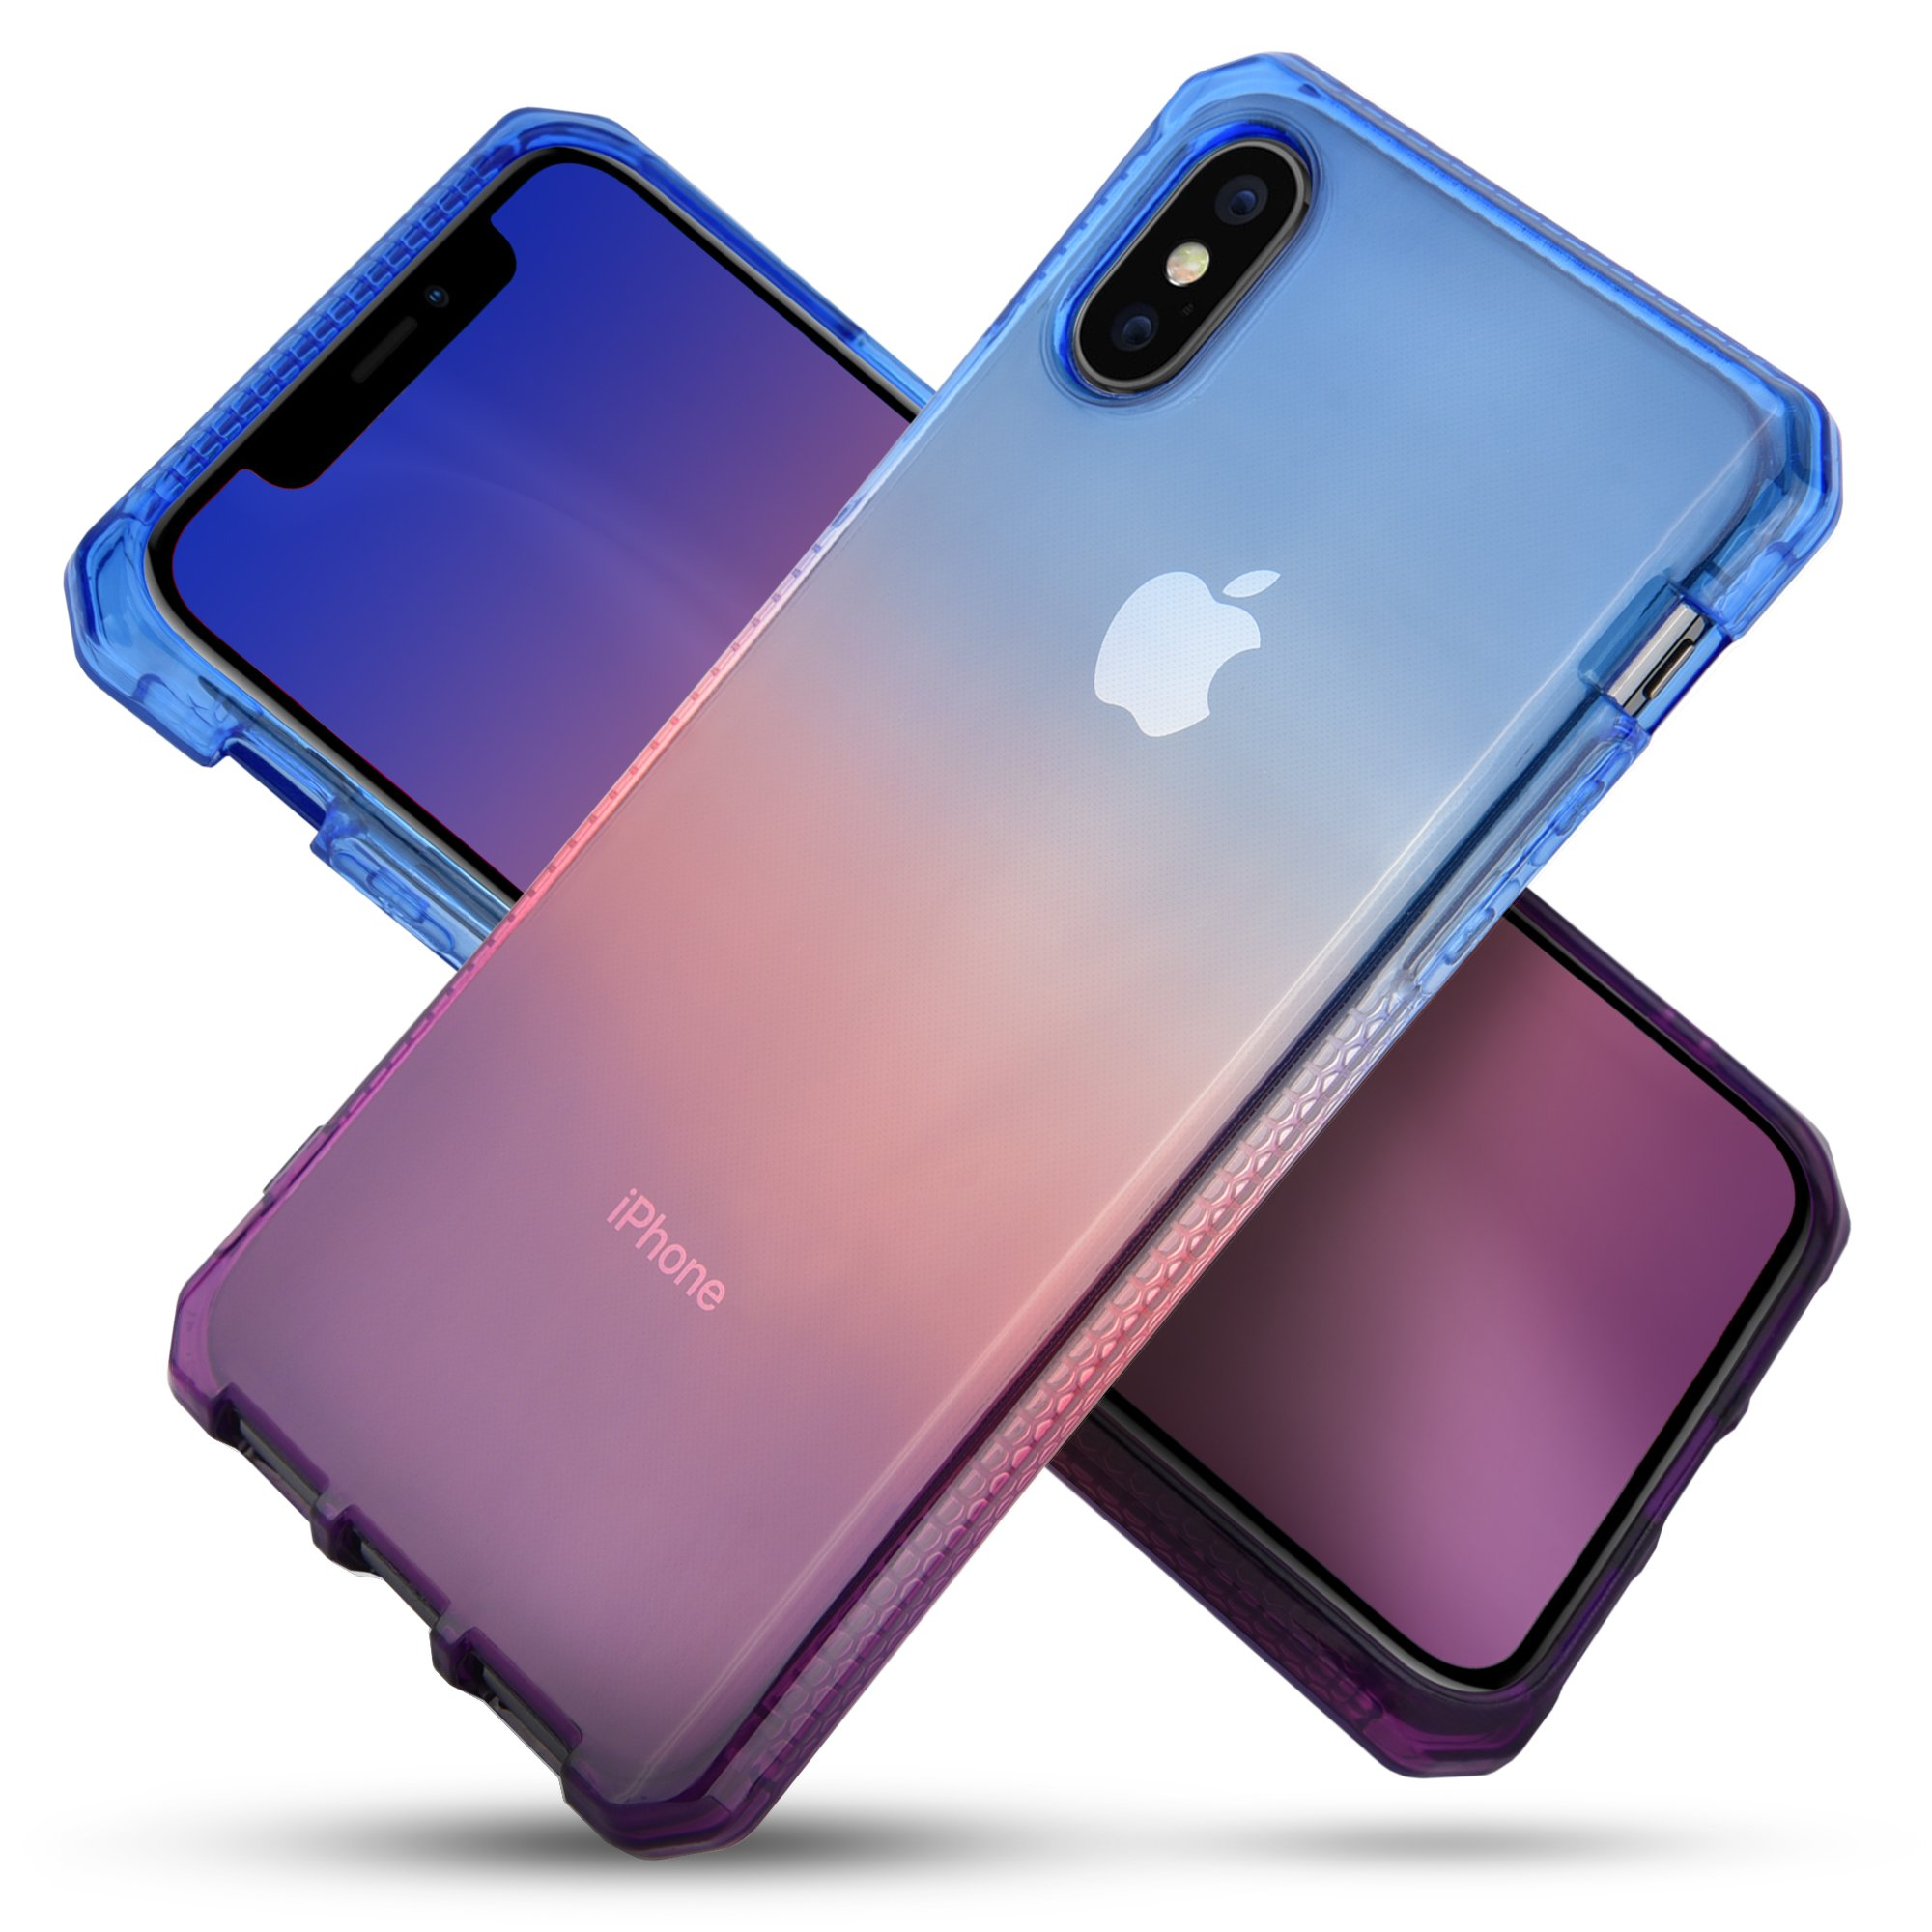 Celljoy Case compatible with iPhone X [[Sunset Gradient TPU Armor]] - High Impact Bumper - Transparent - Colorful - Flexible - Extreme Drop Protection - Premium - Slim (Blue/Pink/Purple)